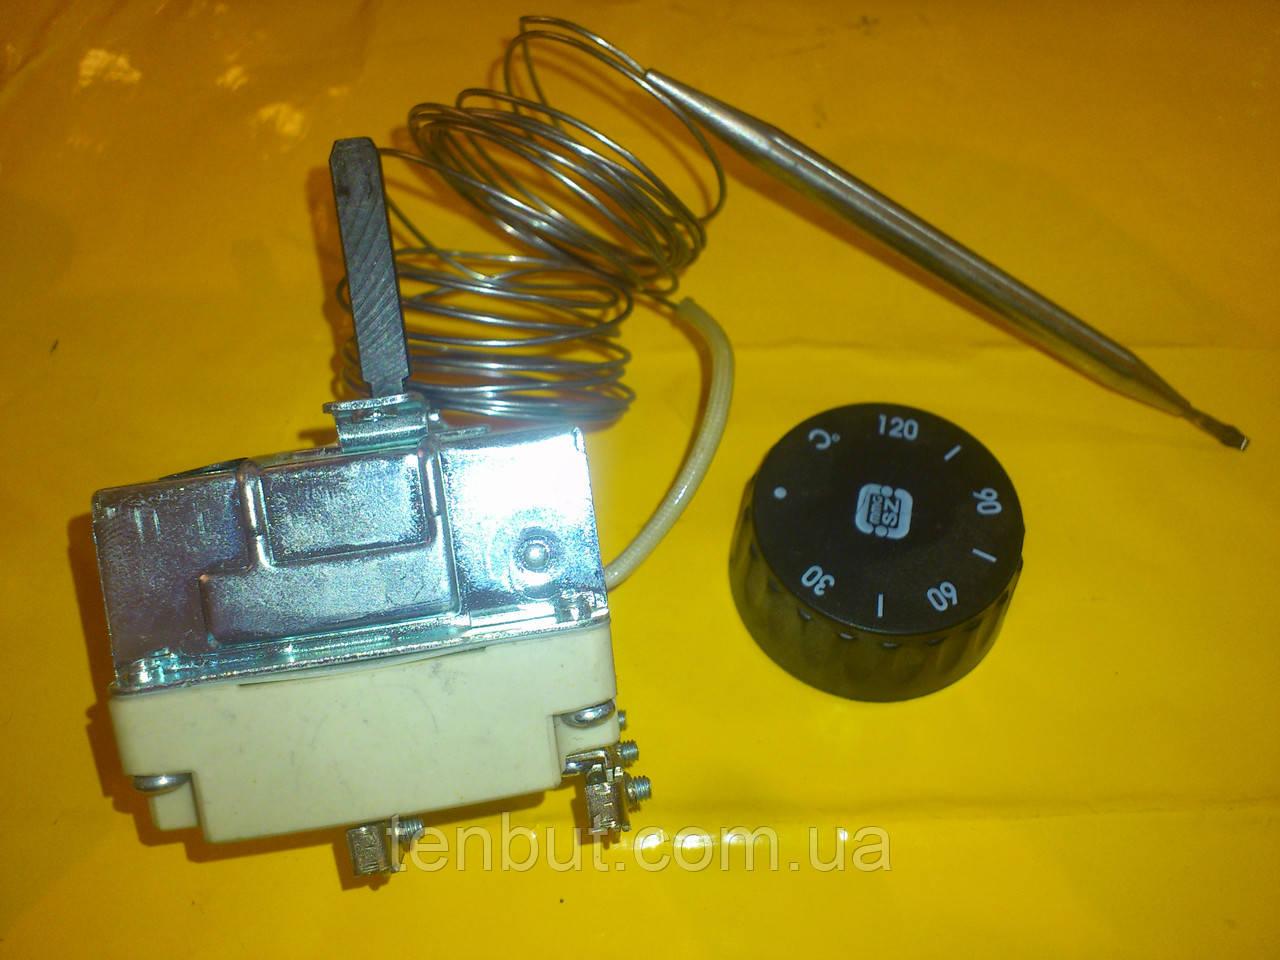 Терморегулятор MMG - 120 ℃ / 3-х полюсный капилярный 2.2 м. производство Венгрия